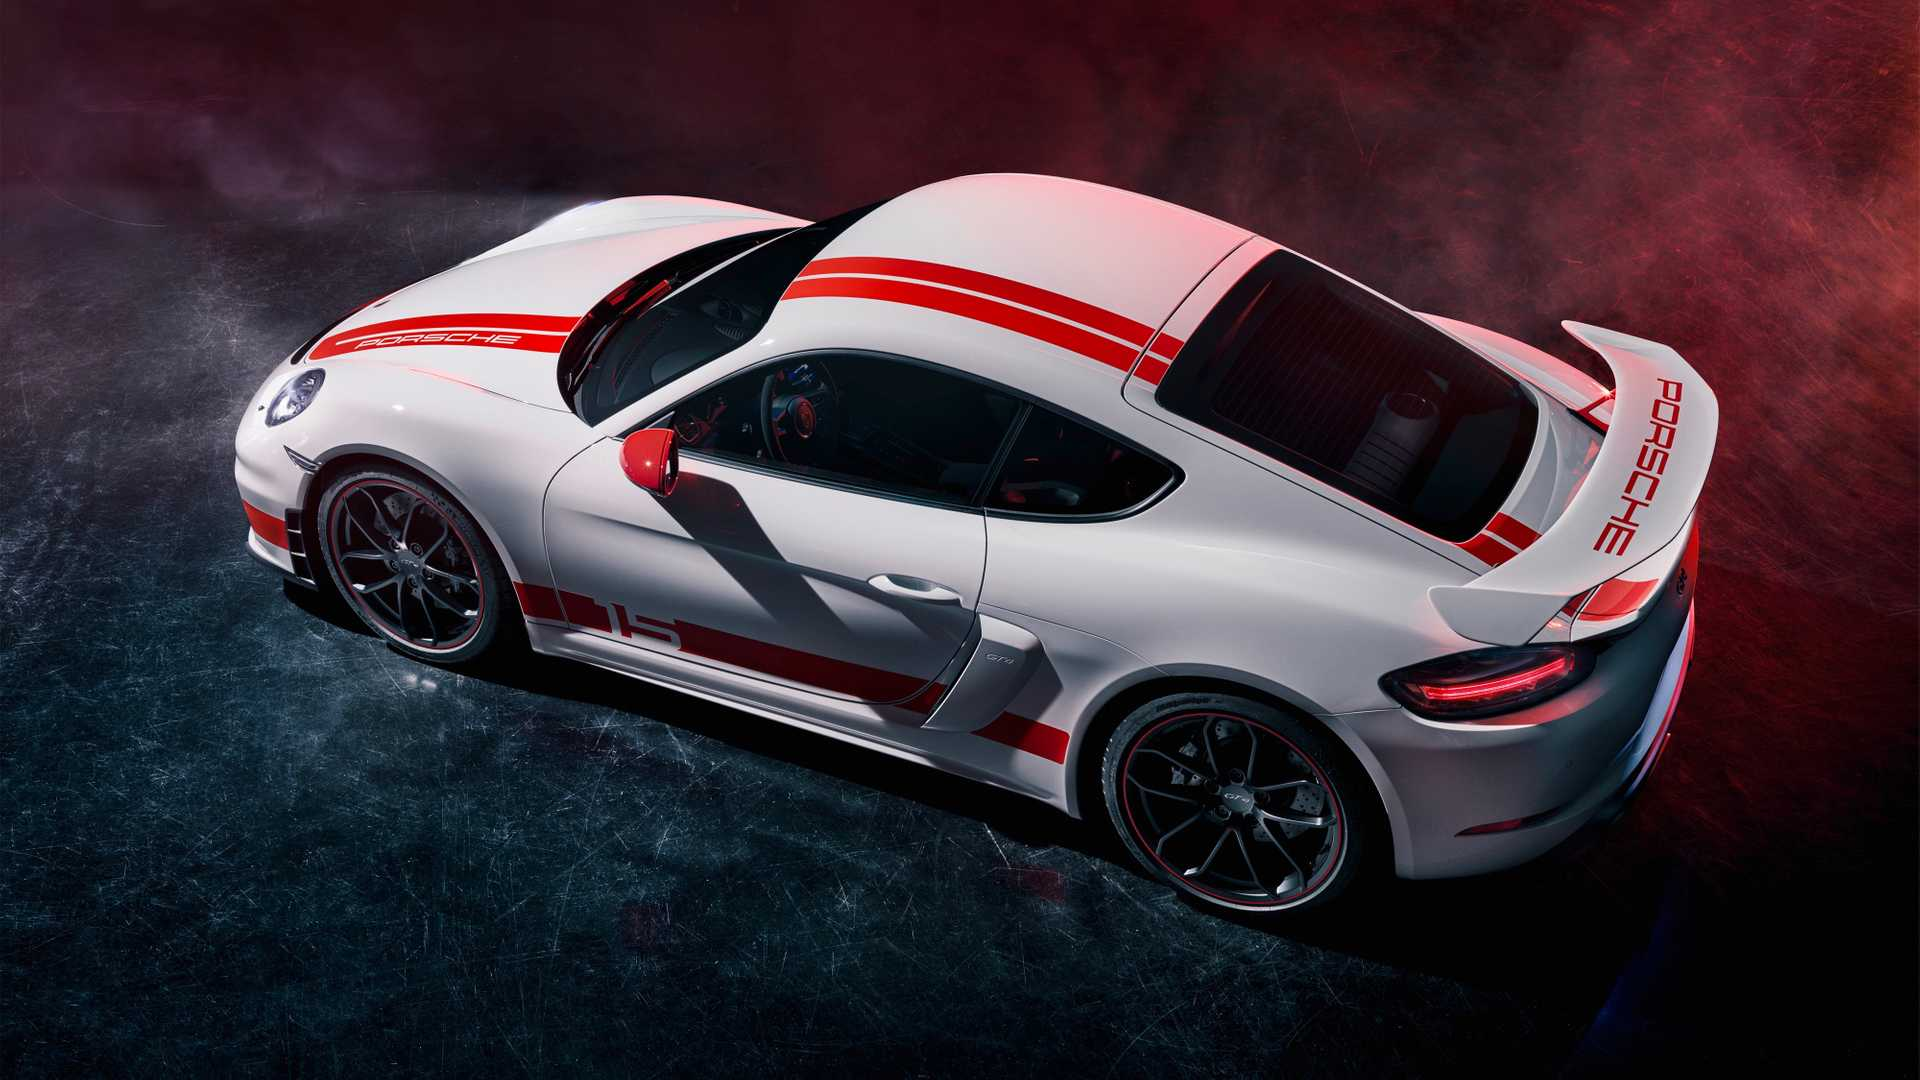 2016 - [Porsche] 718 Boxster & 718 Cayman [982] - Page 8 Porsche-718-cayman-gt4-sports-cup-edition